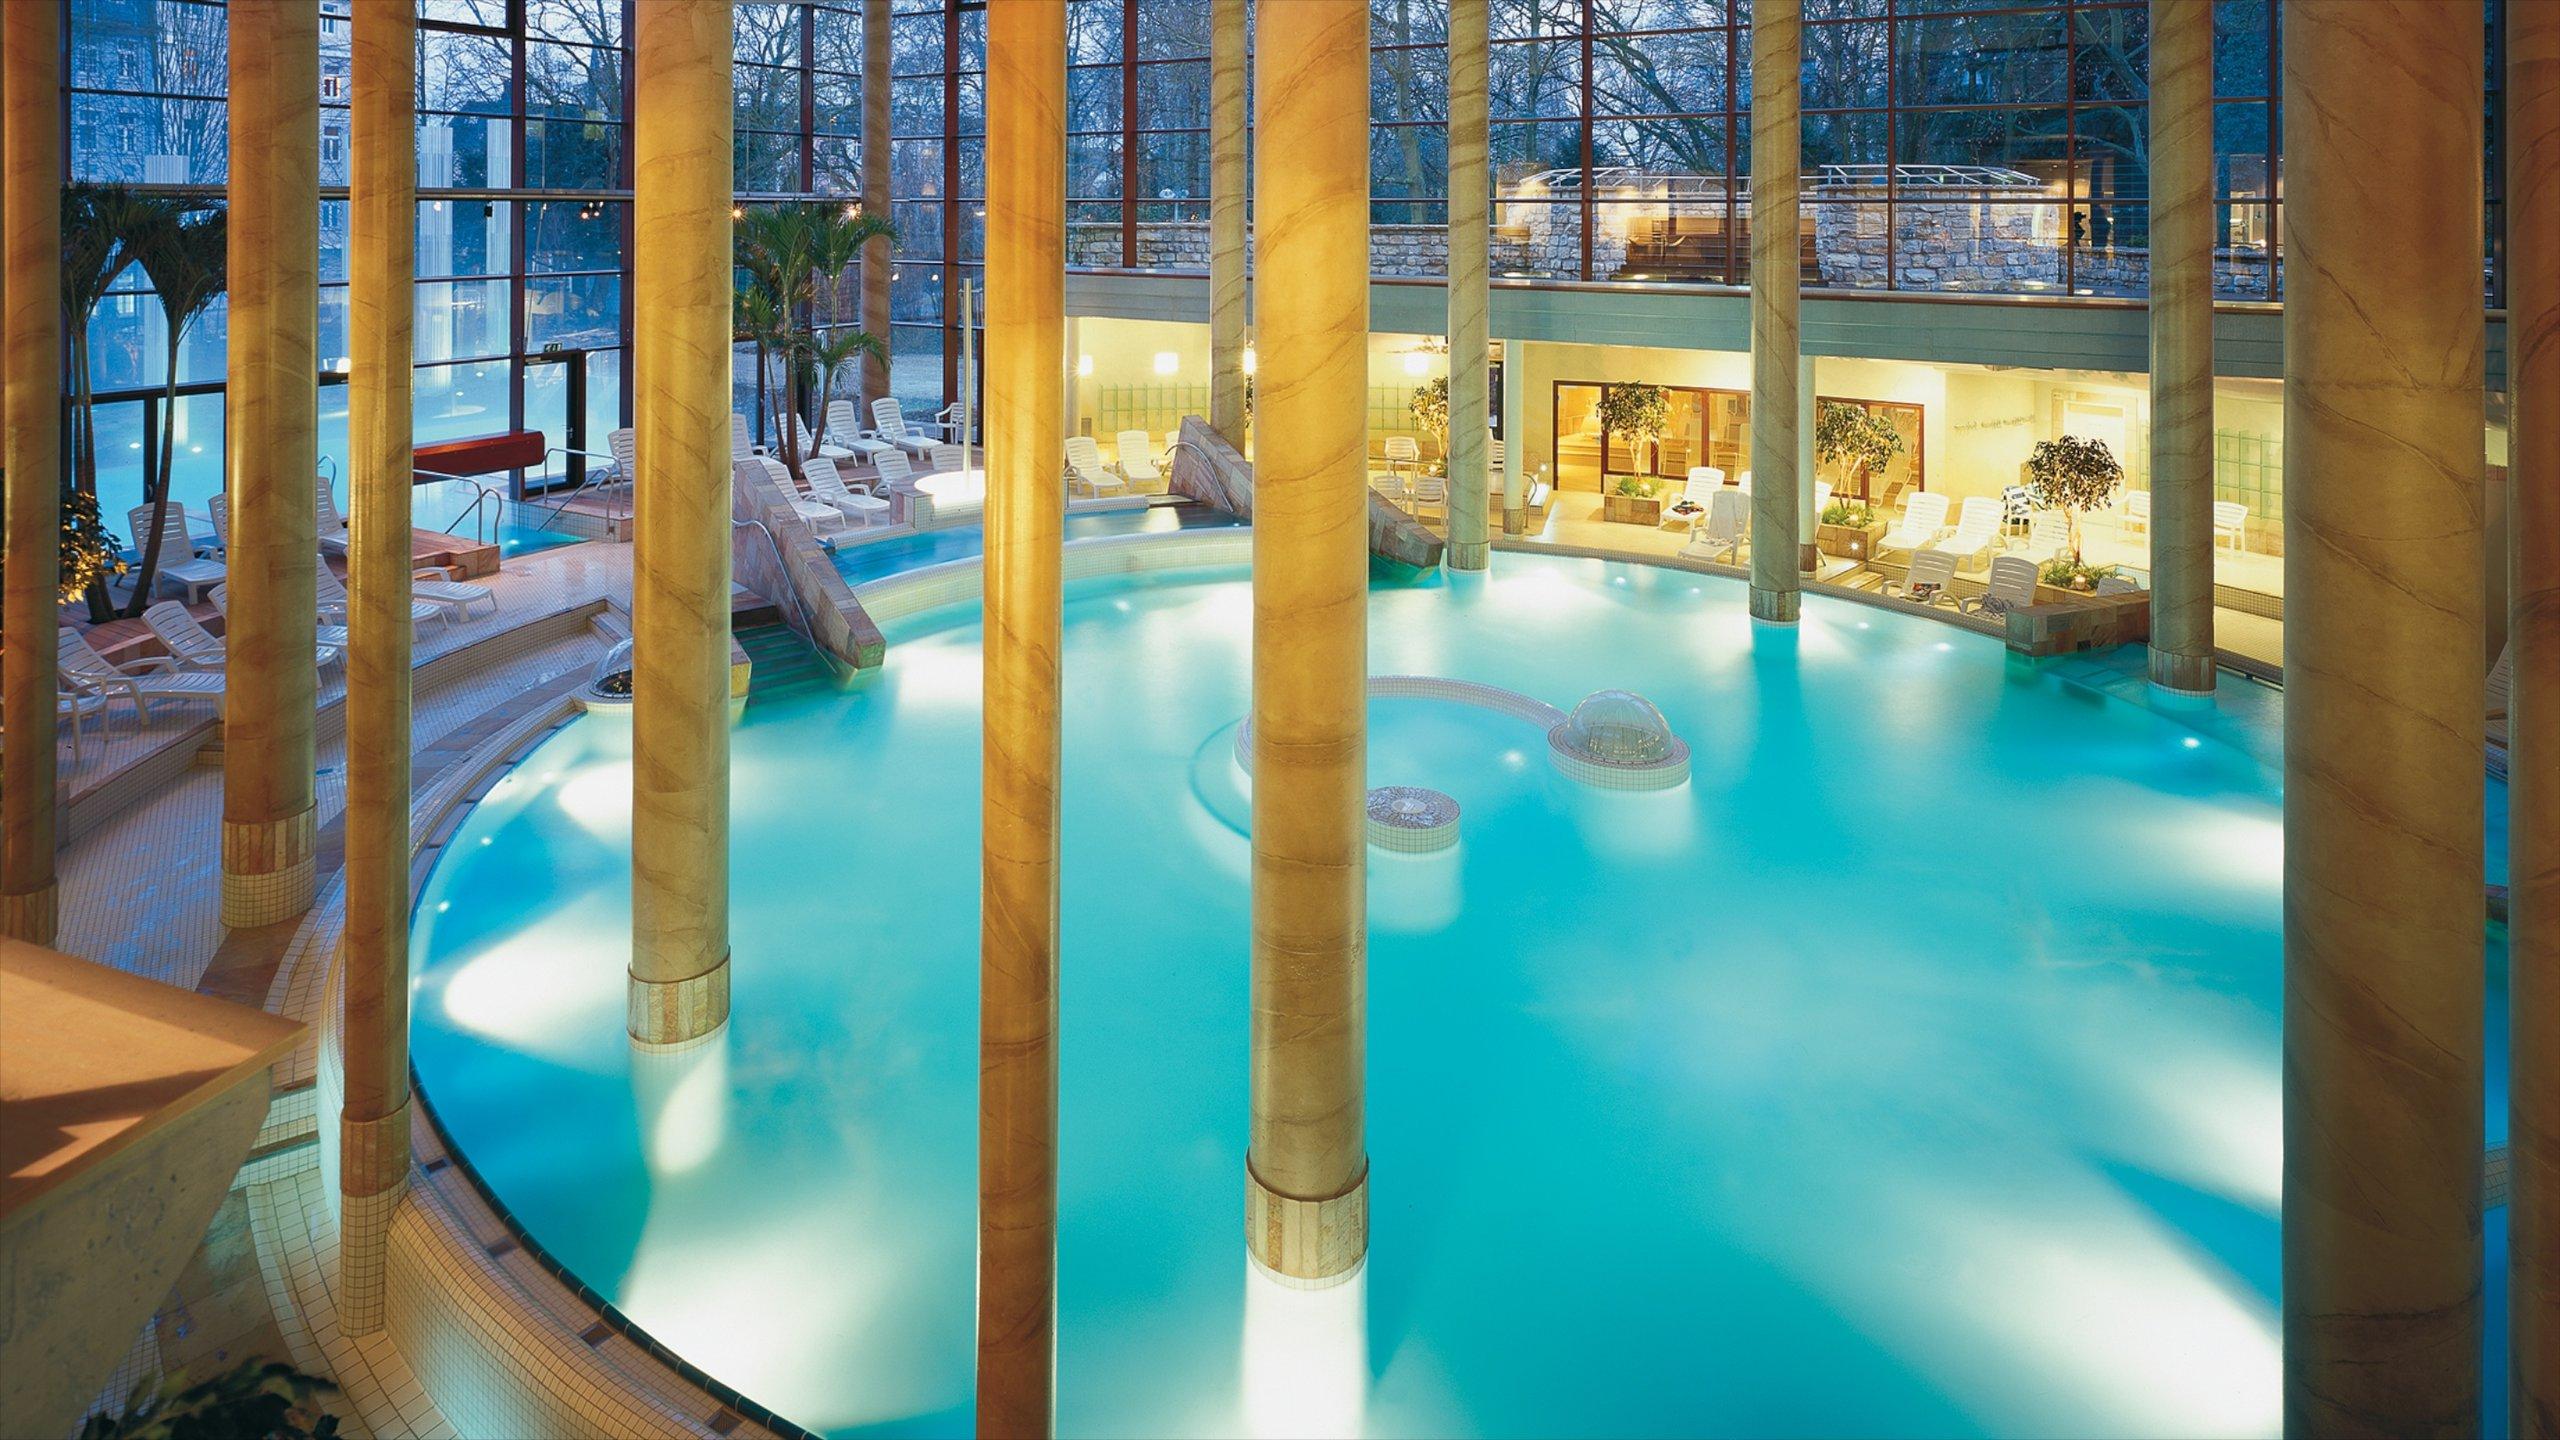 Hotel Aachen Gunstig Buchen Hotels Expedia De